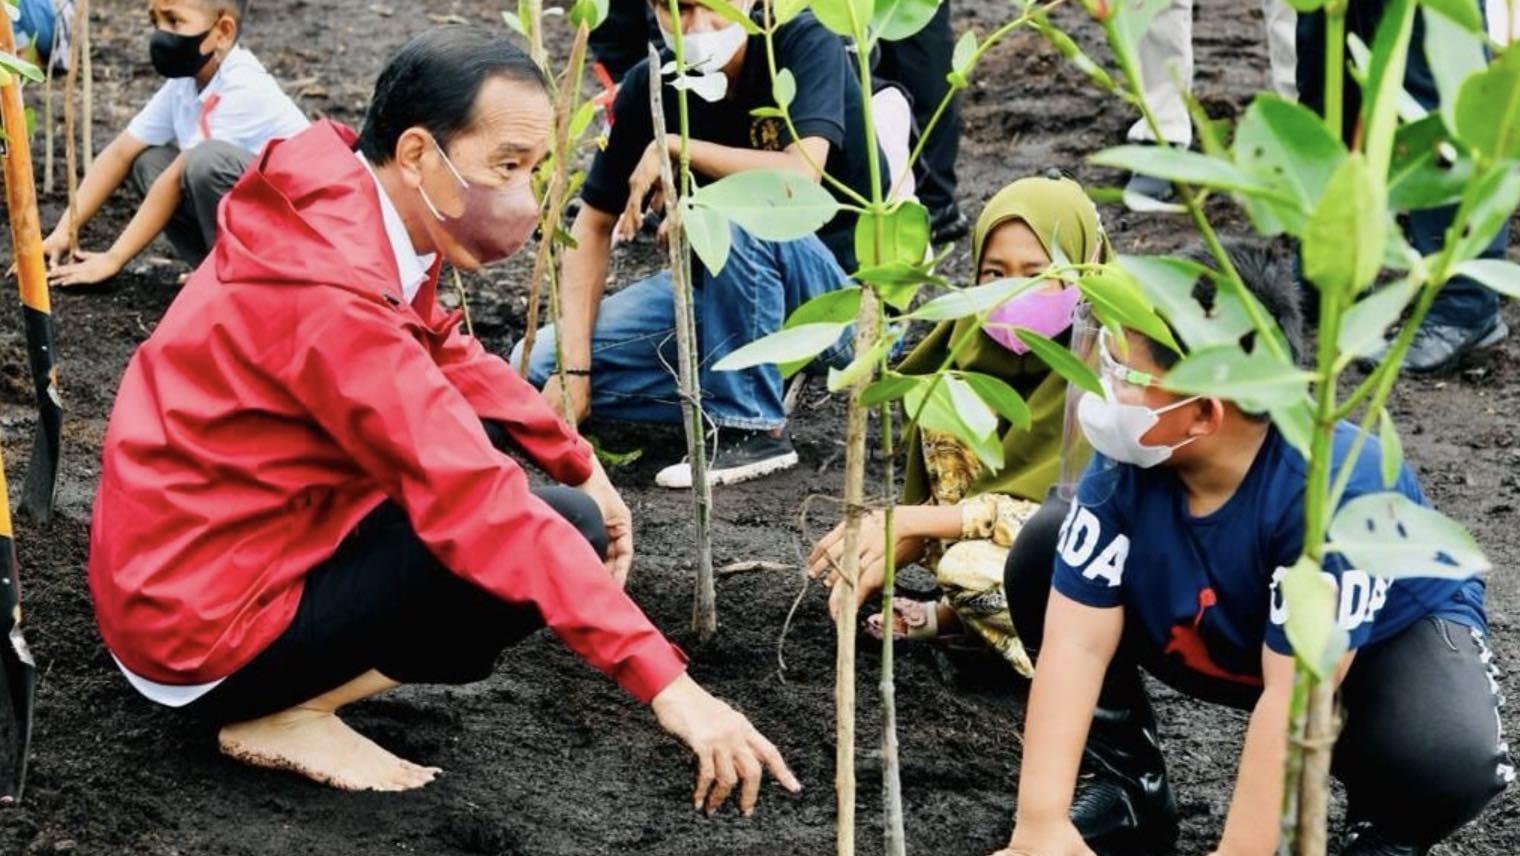 Presiden Joko Widodo saat menanam pohon mangrove bersama masyarakat di Pantai Setokok, Kecamatan Bulang, Kota Batam, Provinsi Kepulauan Riau, Selasa (28/09/2021).